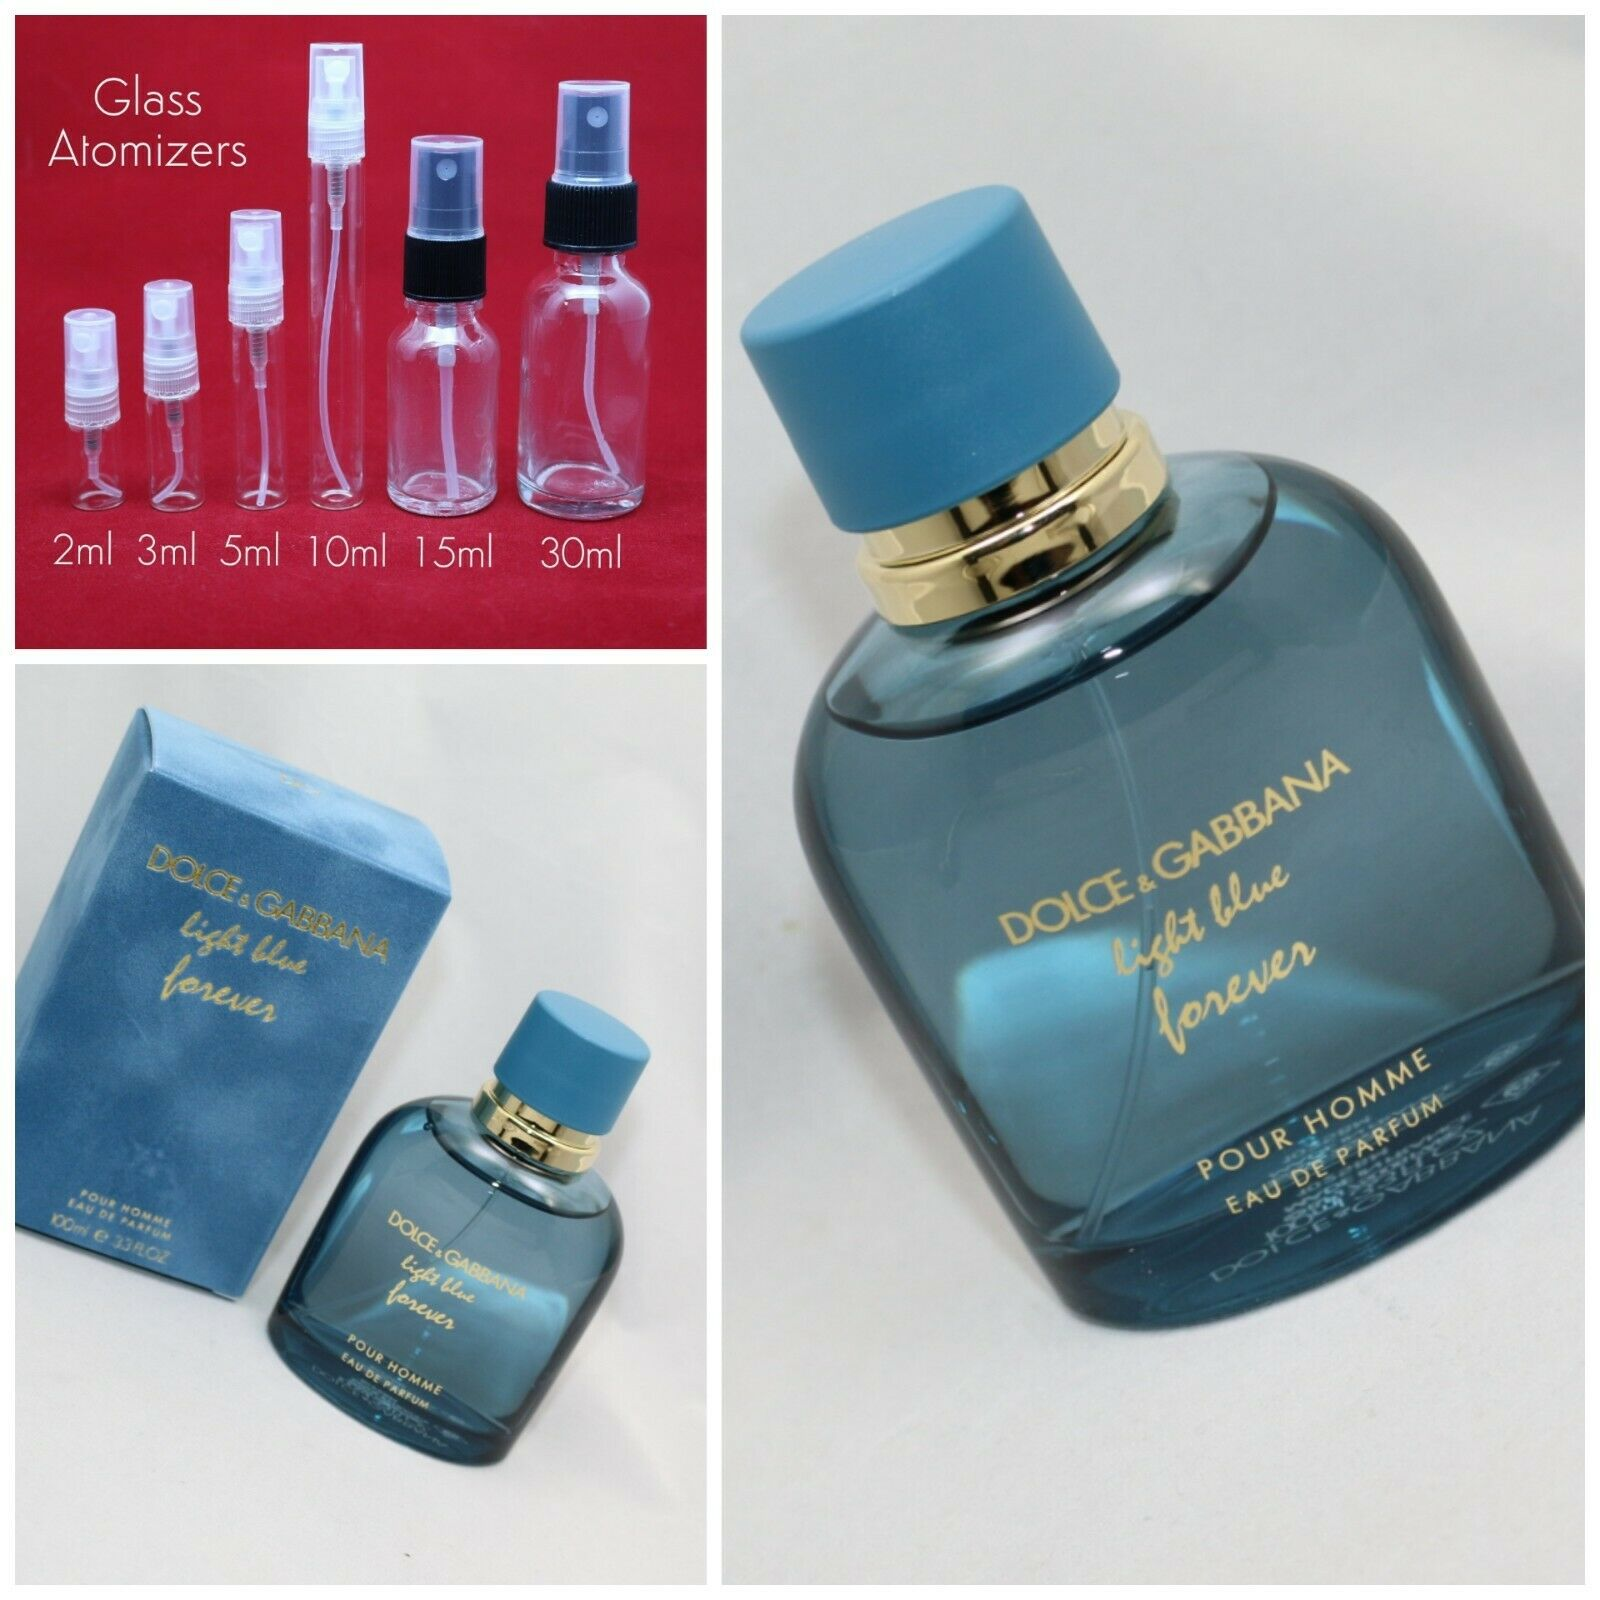 Dolce Gabbana Light Blue Eau Intense Pour Homme Men SAMPLE 2ml 3ml 5ml 10ml 30ml